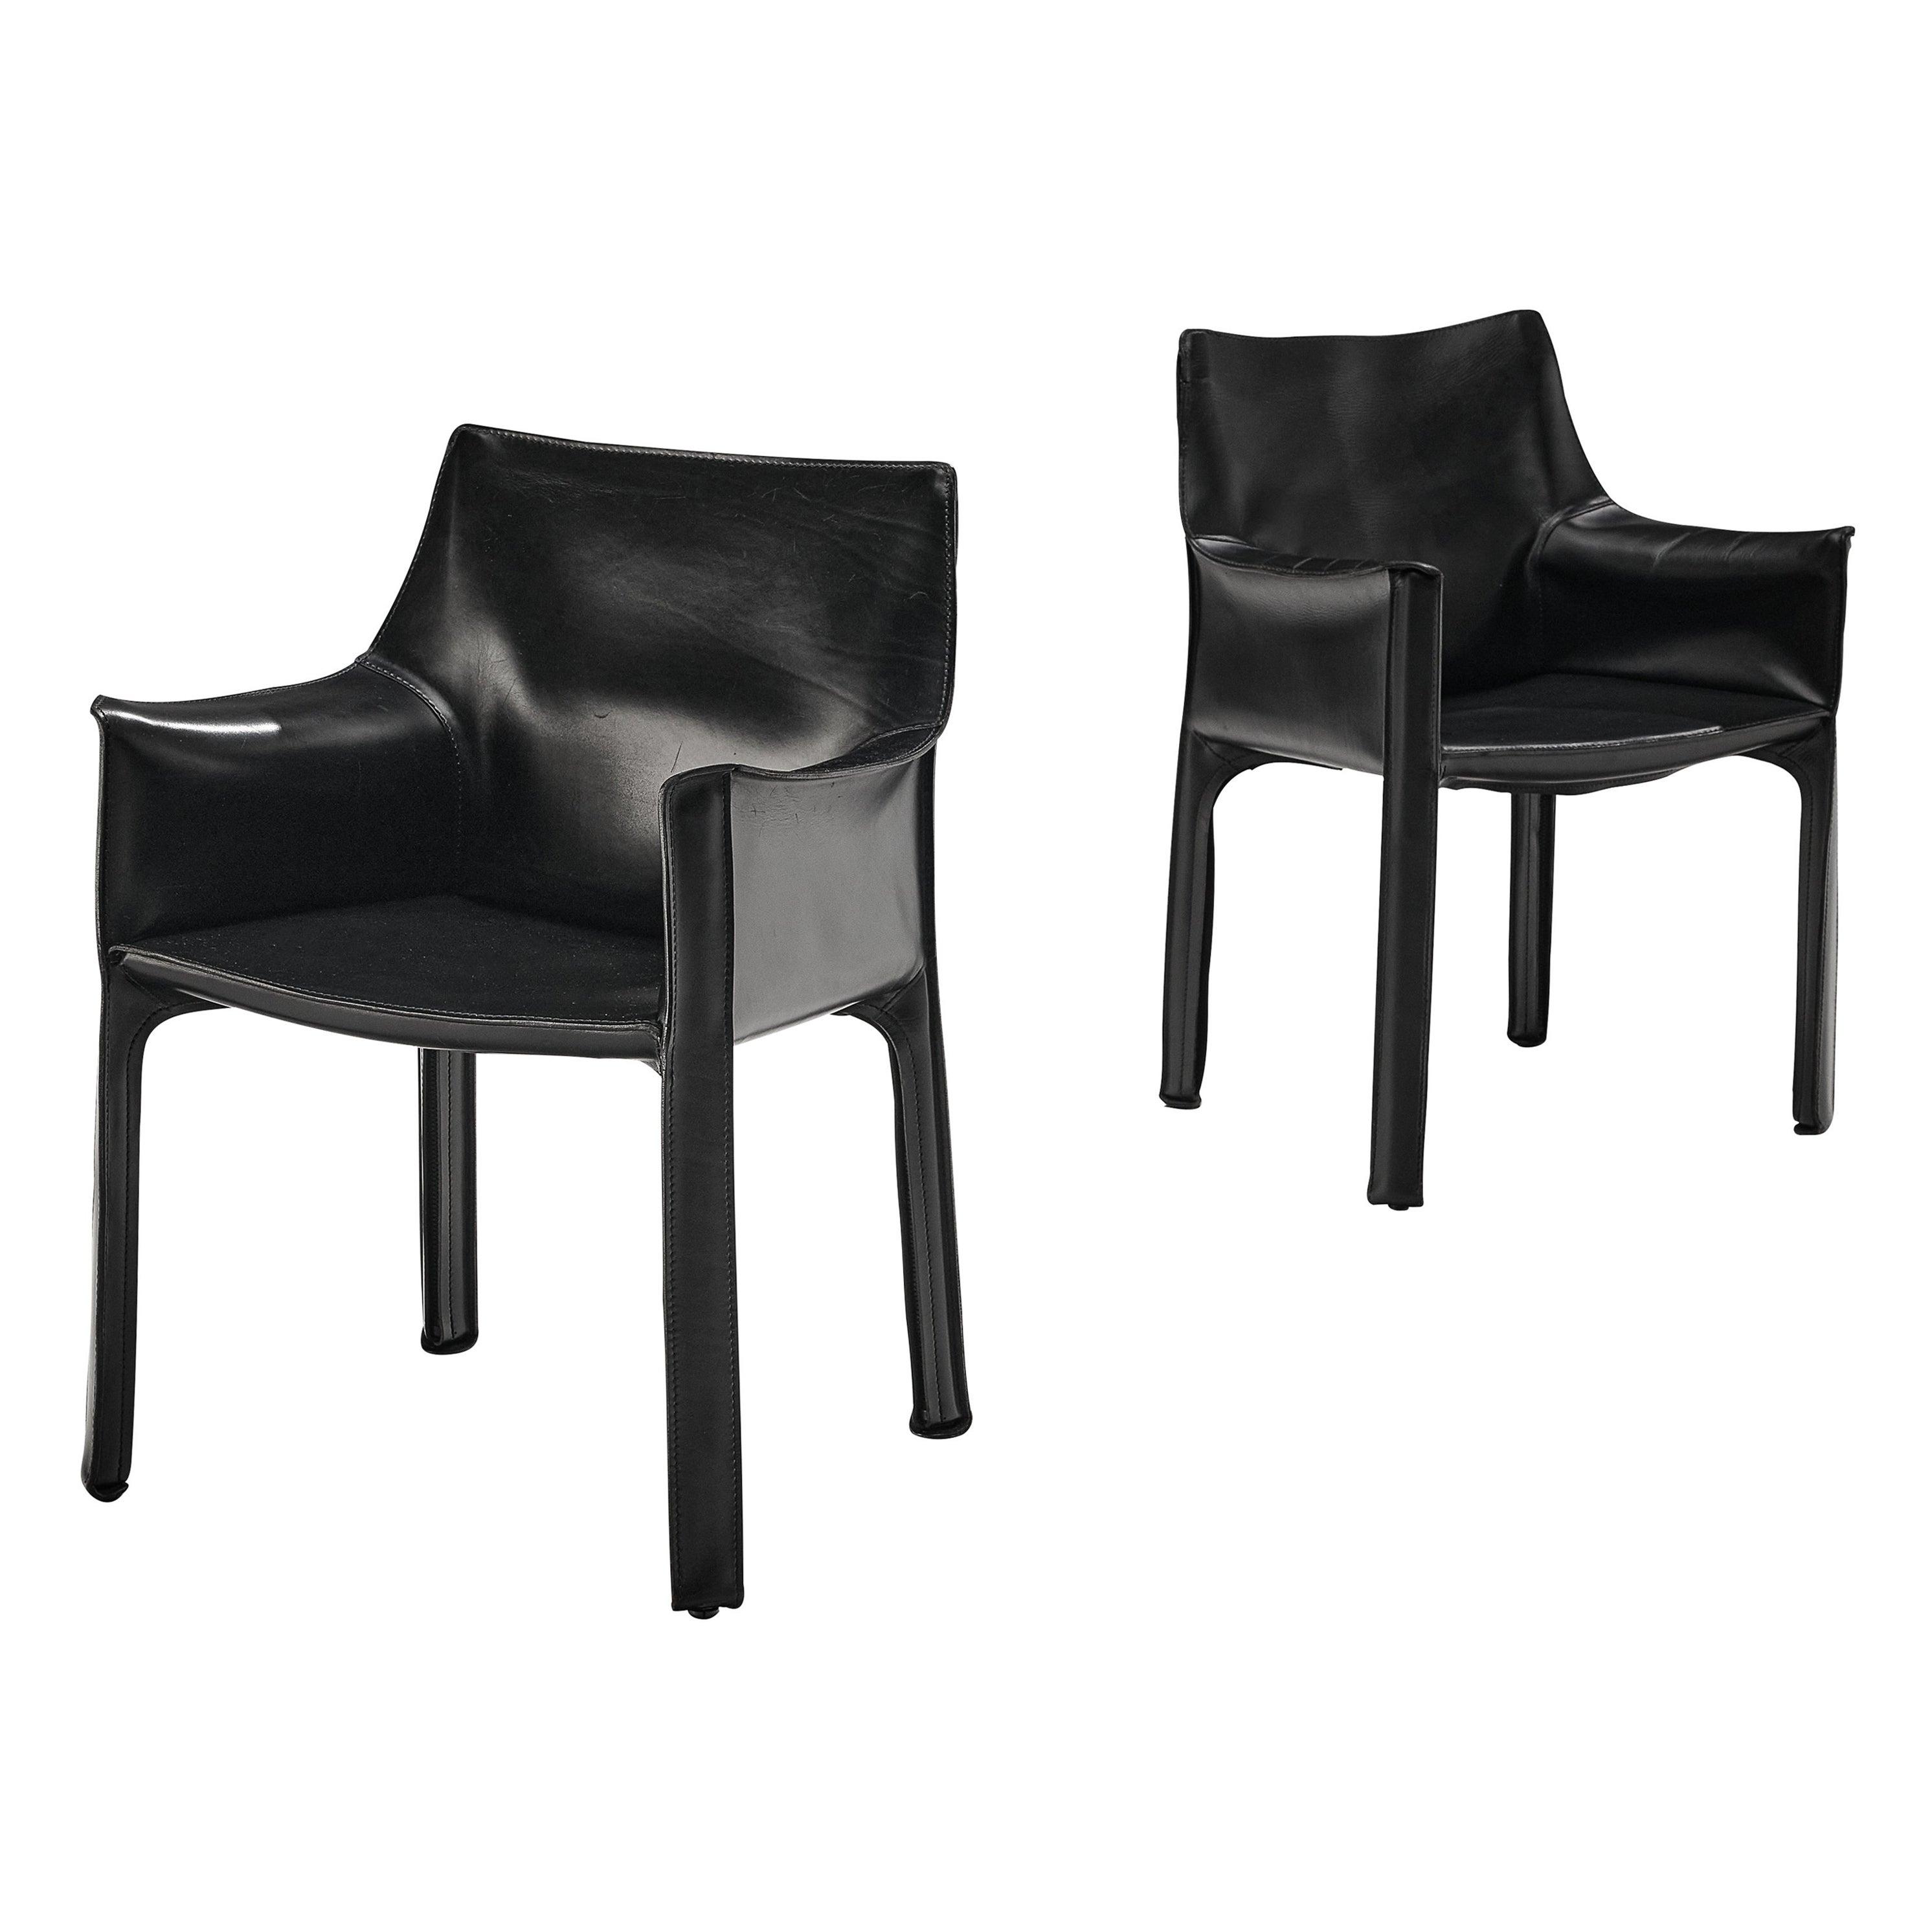 Mario Bellini Pair of Armchairs 'CAB 413' in Black Leather